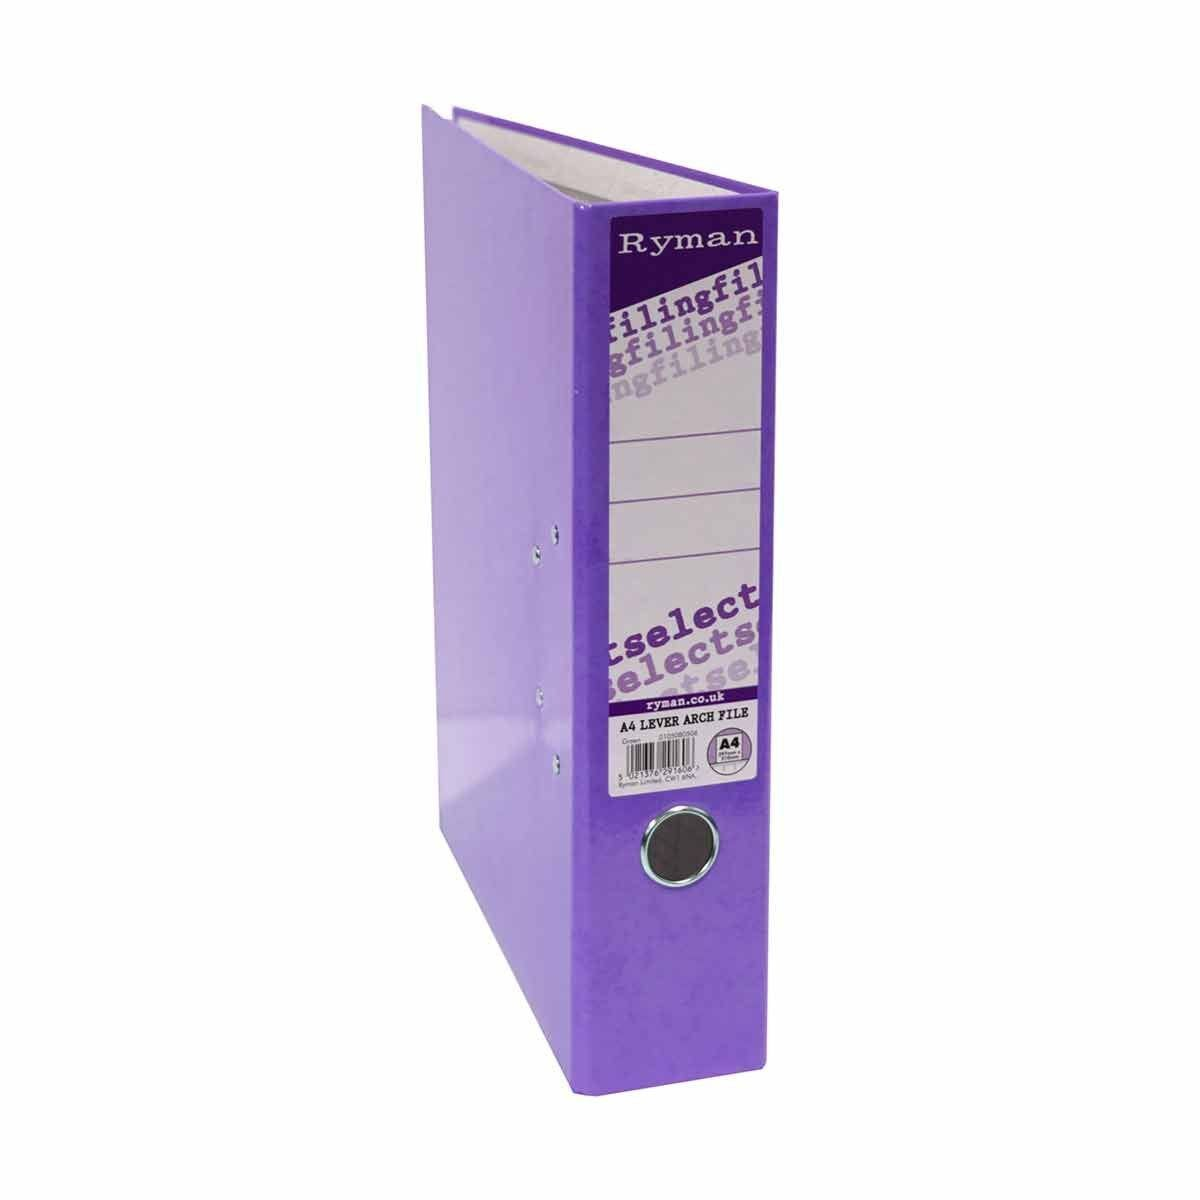 Ryman Select A4 Lever Arch File Purple